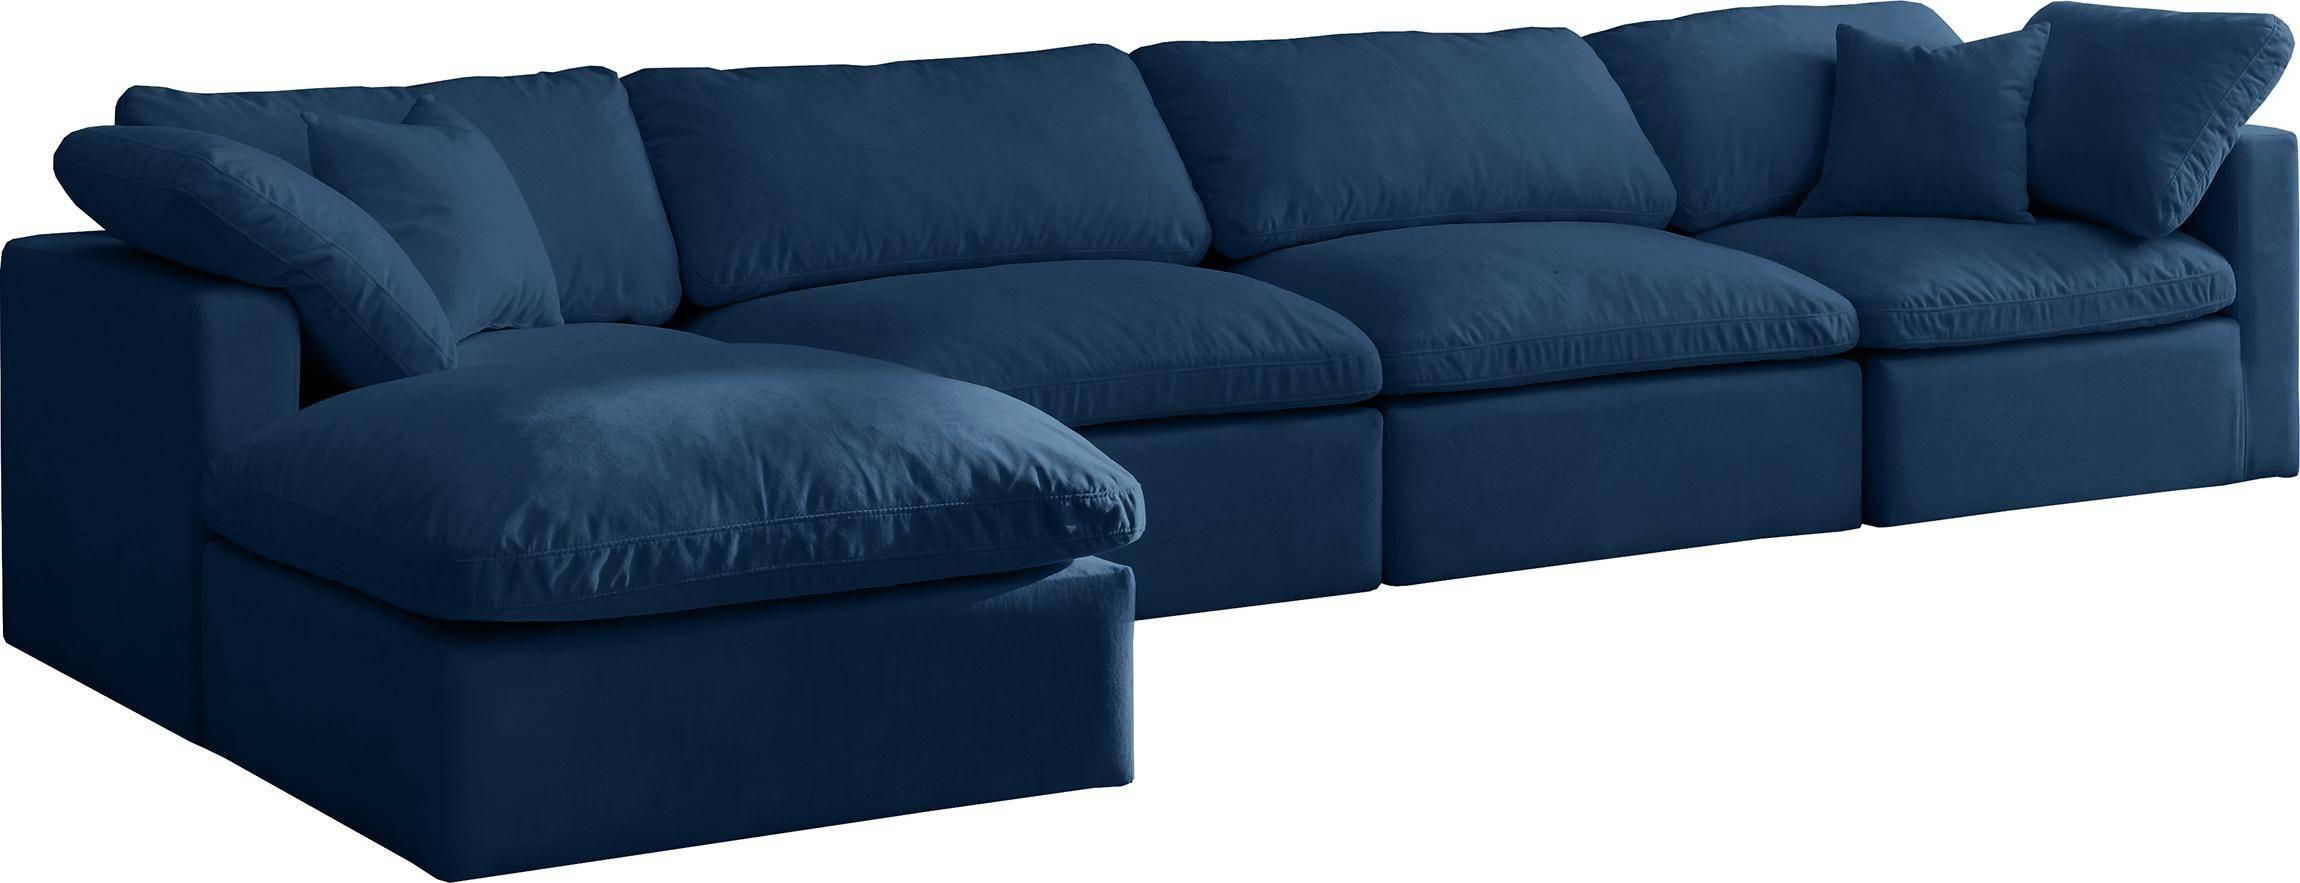 meridian cloud navy modular sectional sofa in navy fabric